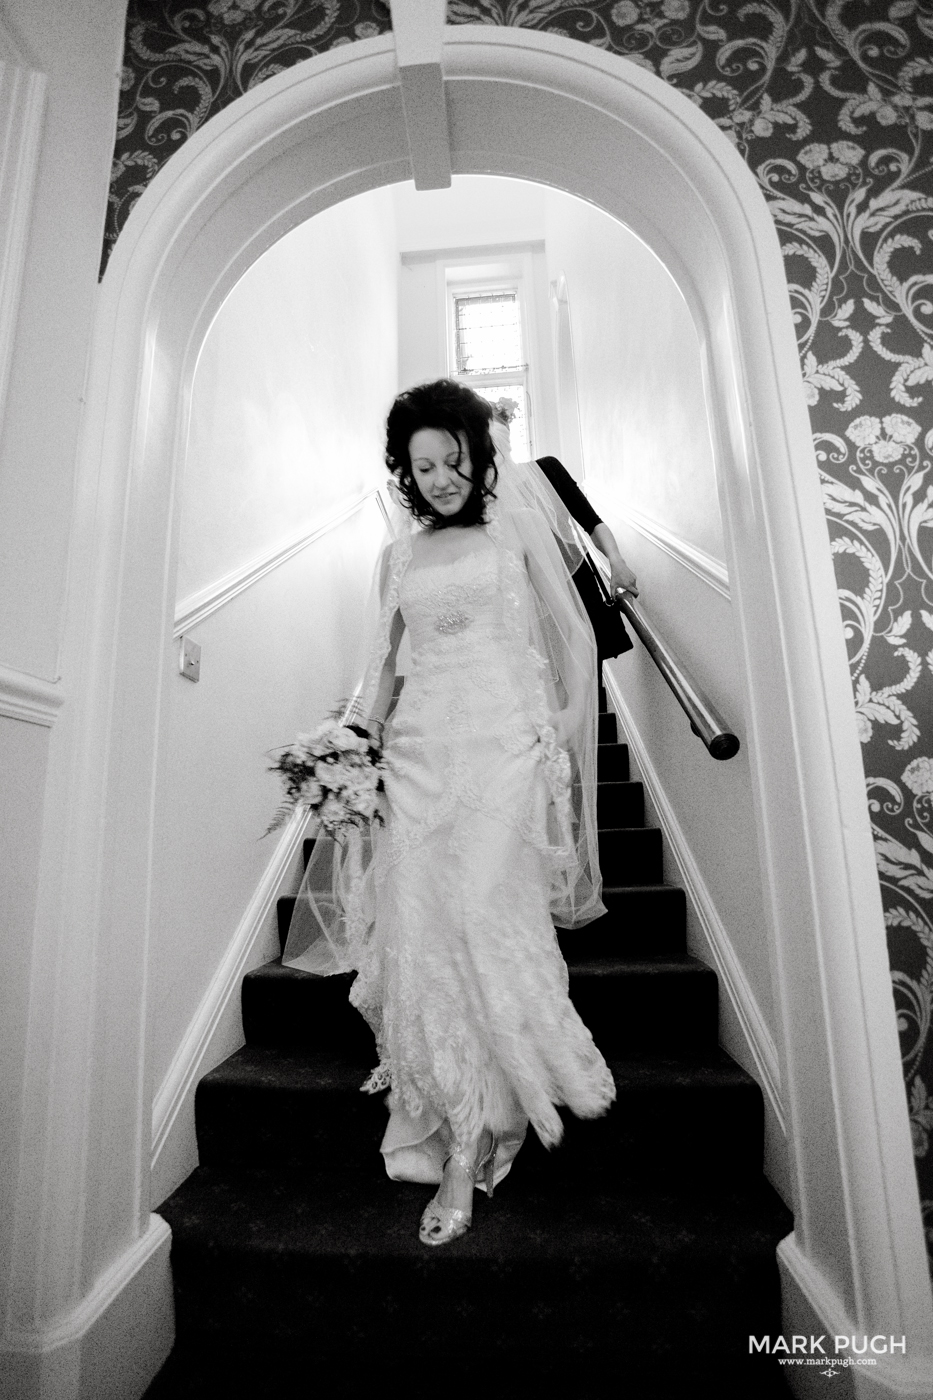 004 - Sorcha and Robin - Wedding Photography at Kelham House Country Manor Hotel by Mark Pugh www.markpugh.com.jpg